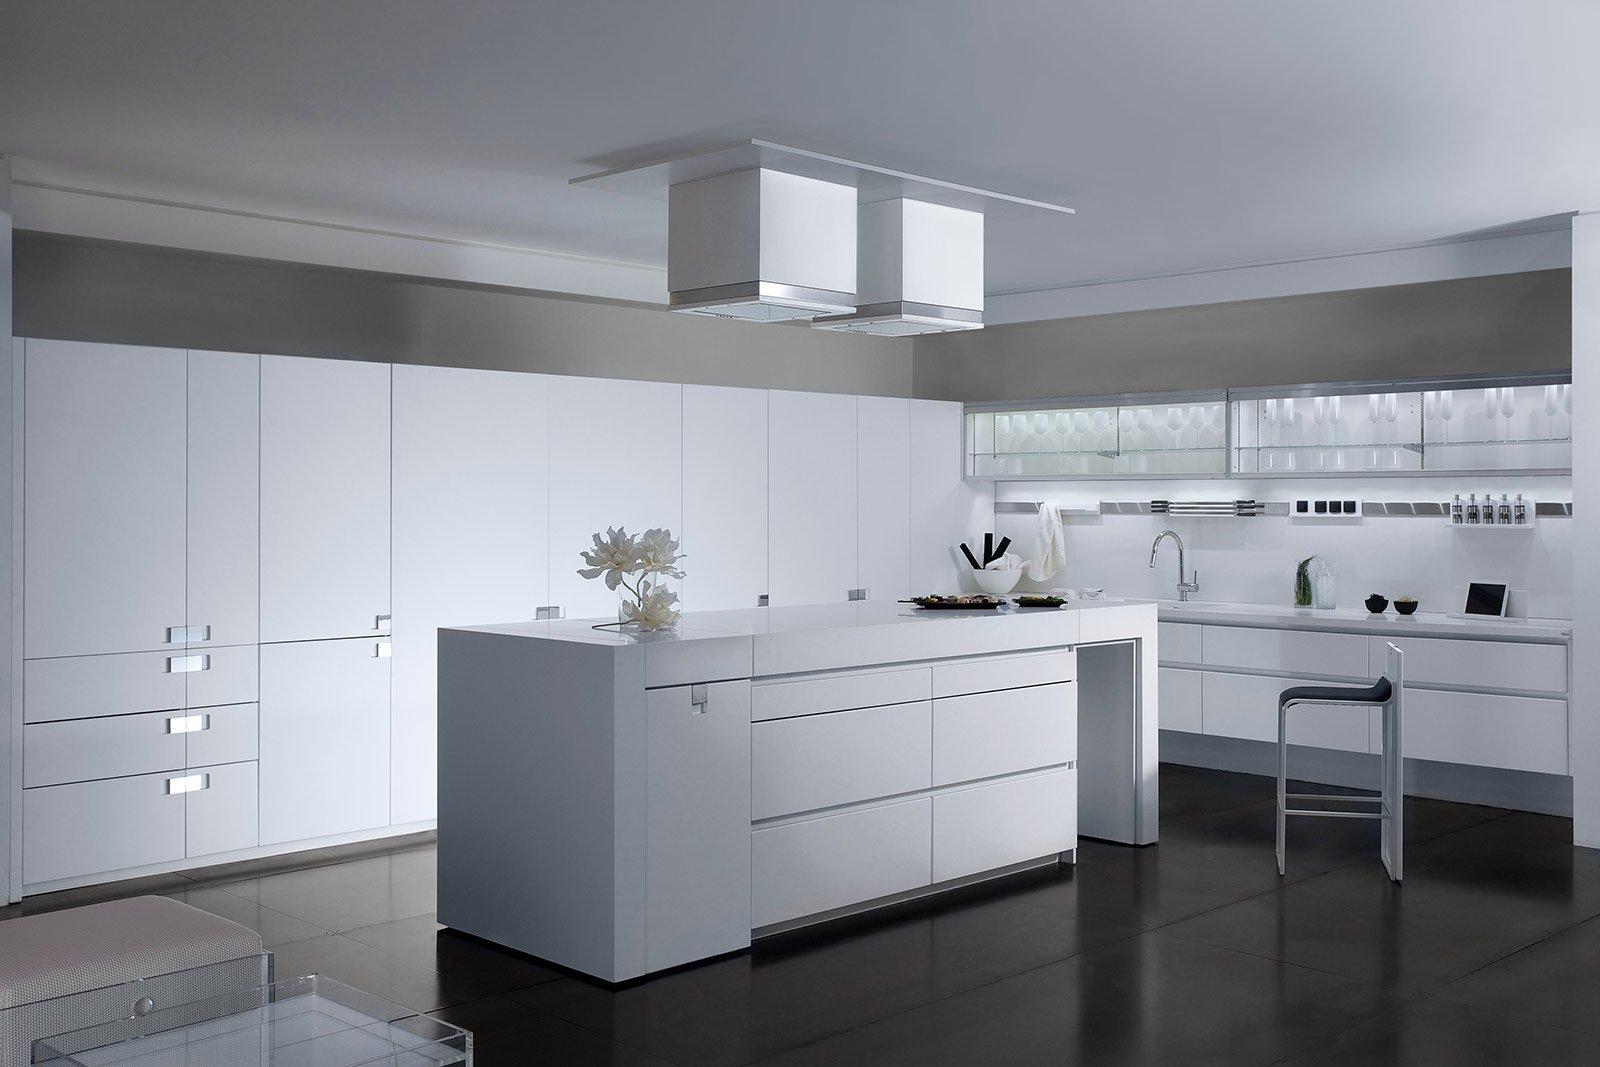 Cucine bianche moderne cose di casa for Cucine con isola moderne